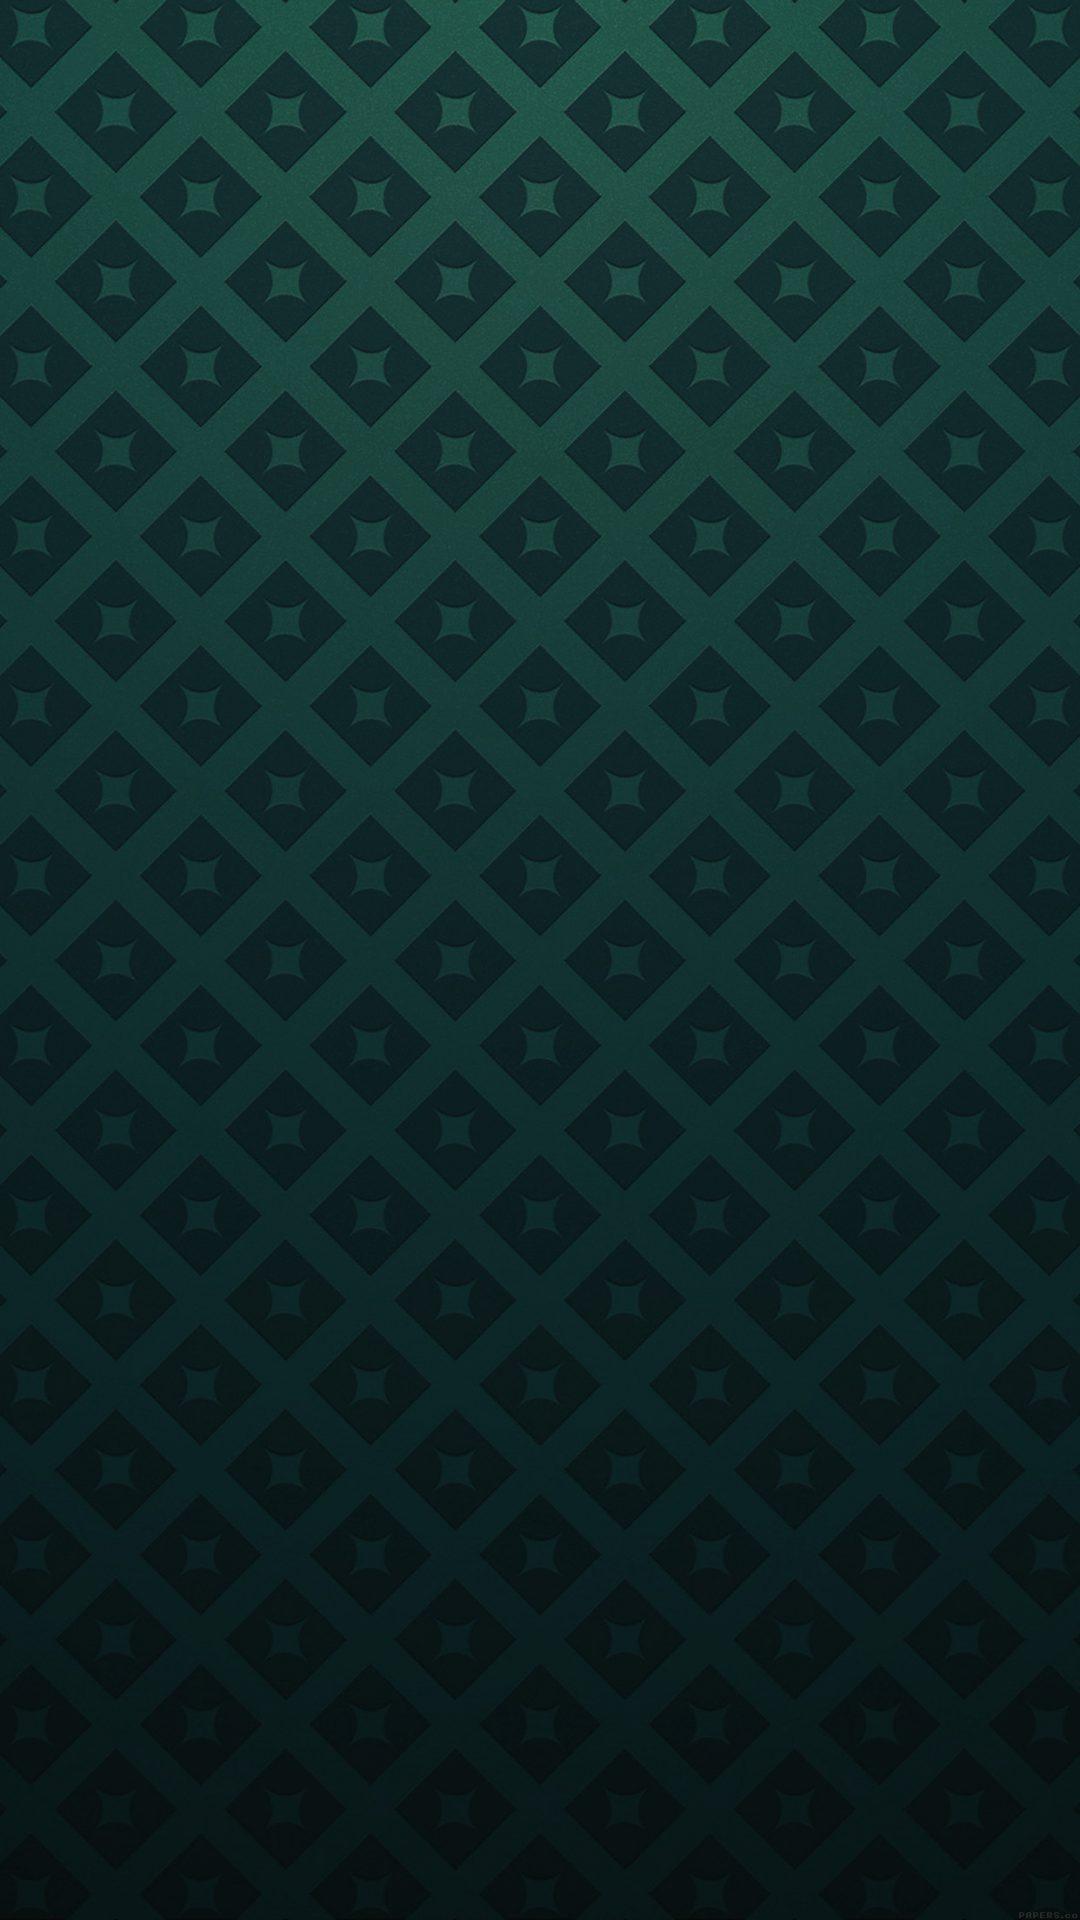 Patterns Art Green Digital Abstract Wall